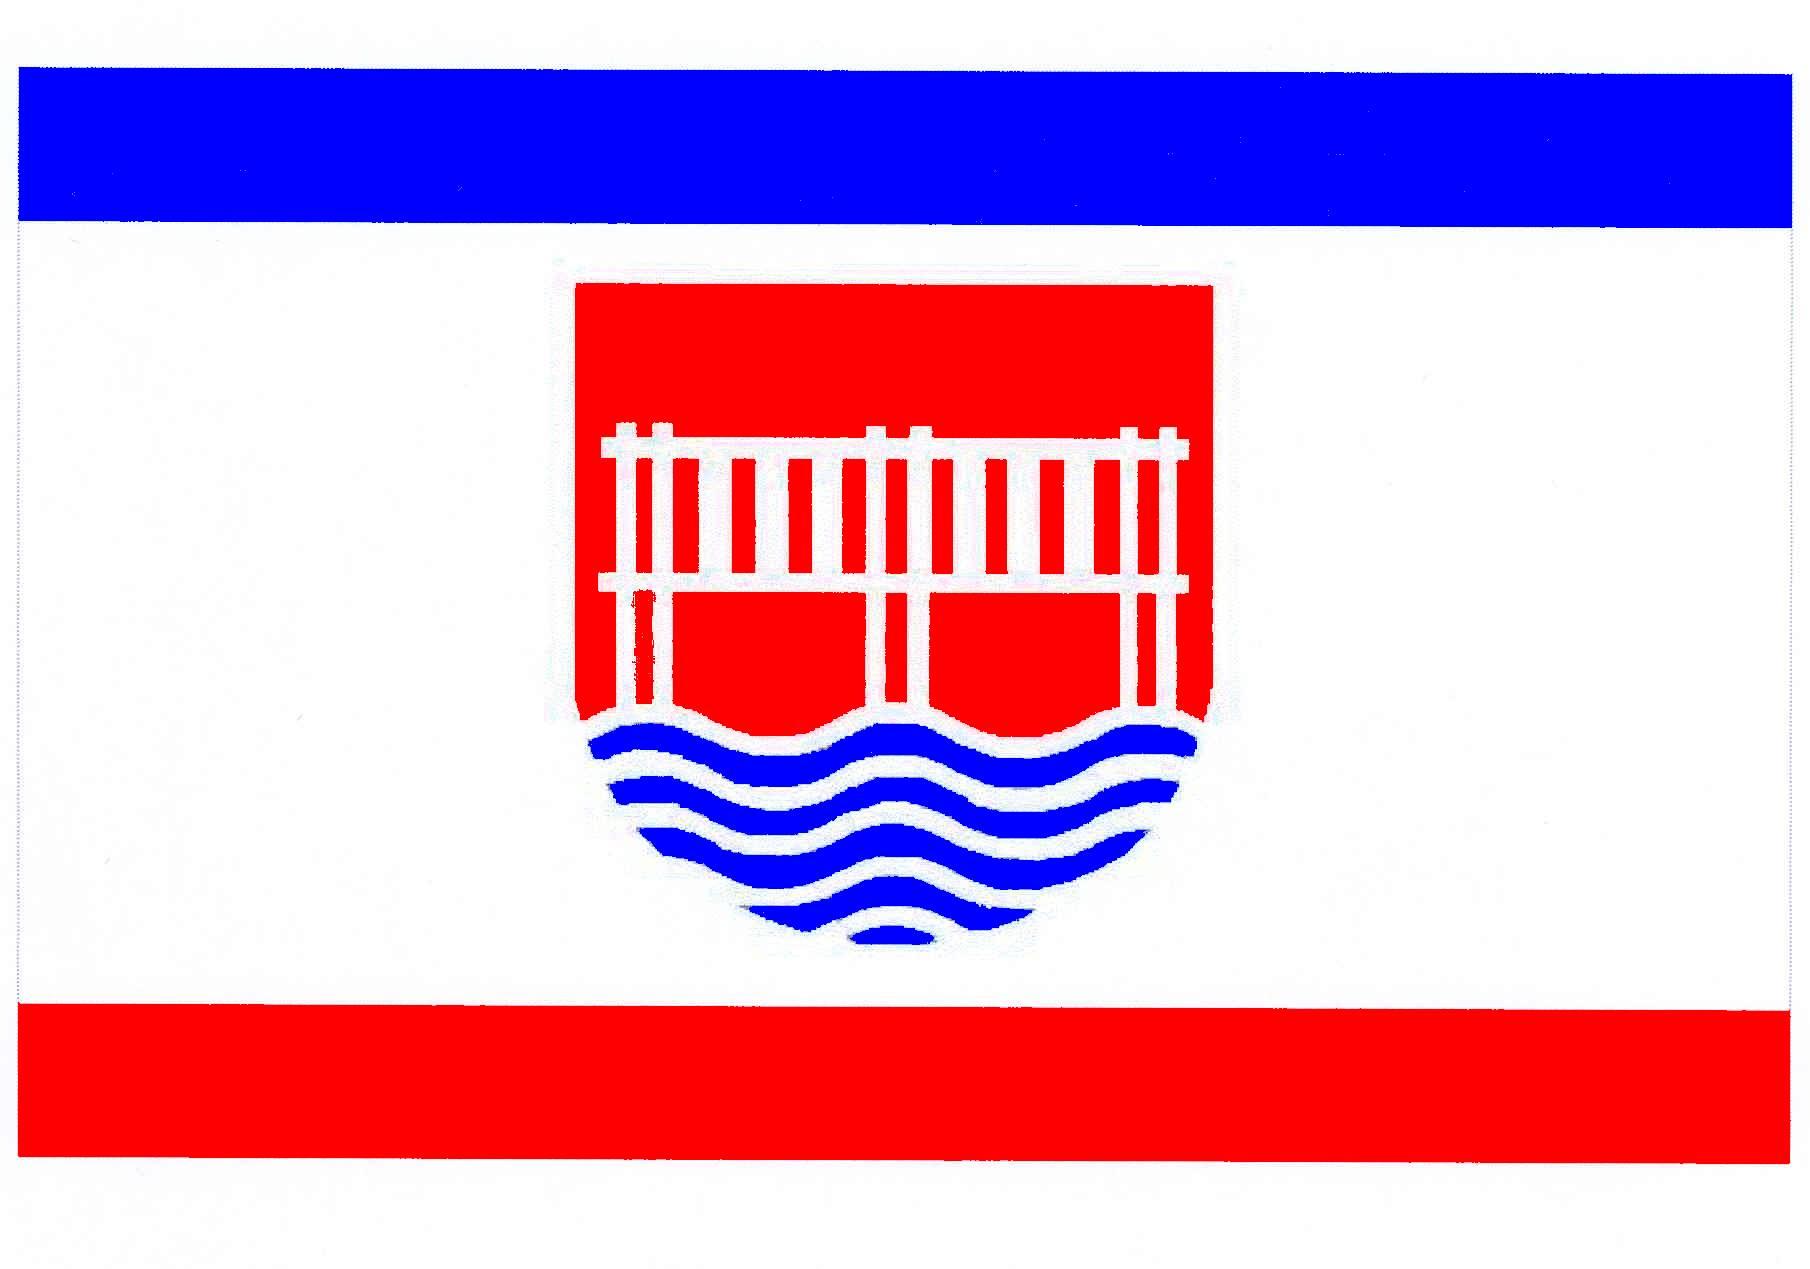 Flagge StadtBredstedt, Kreis Nordfriesland